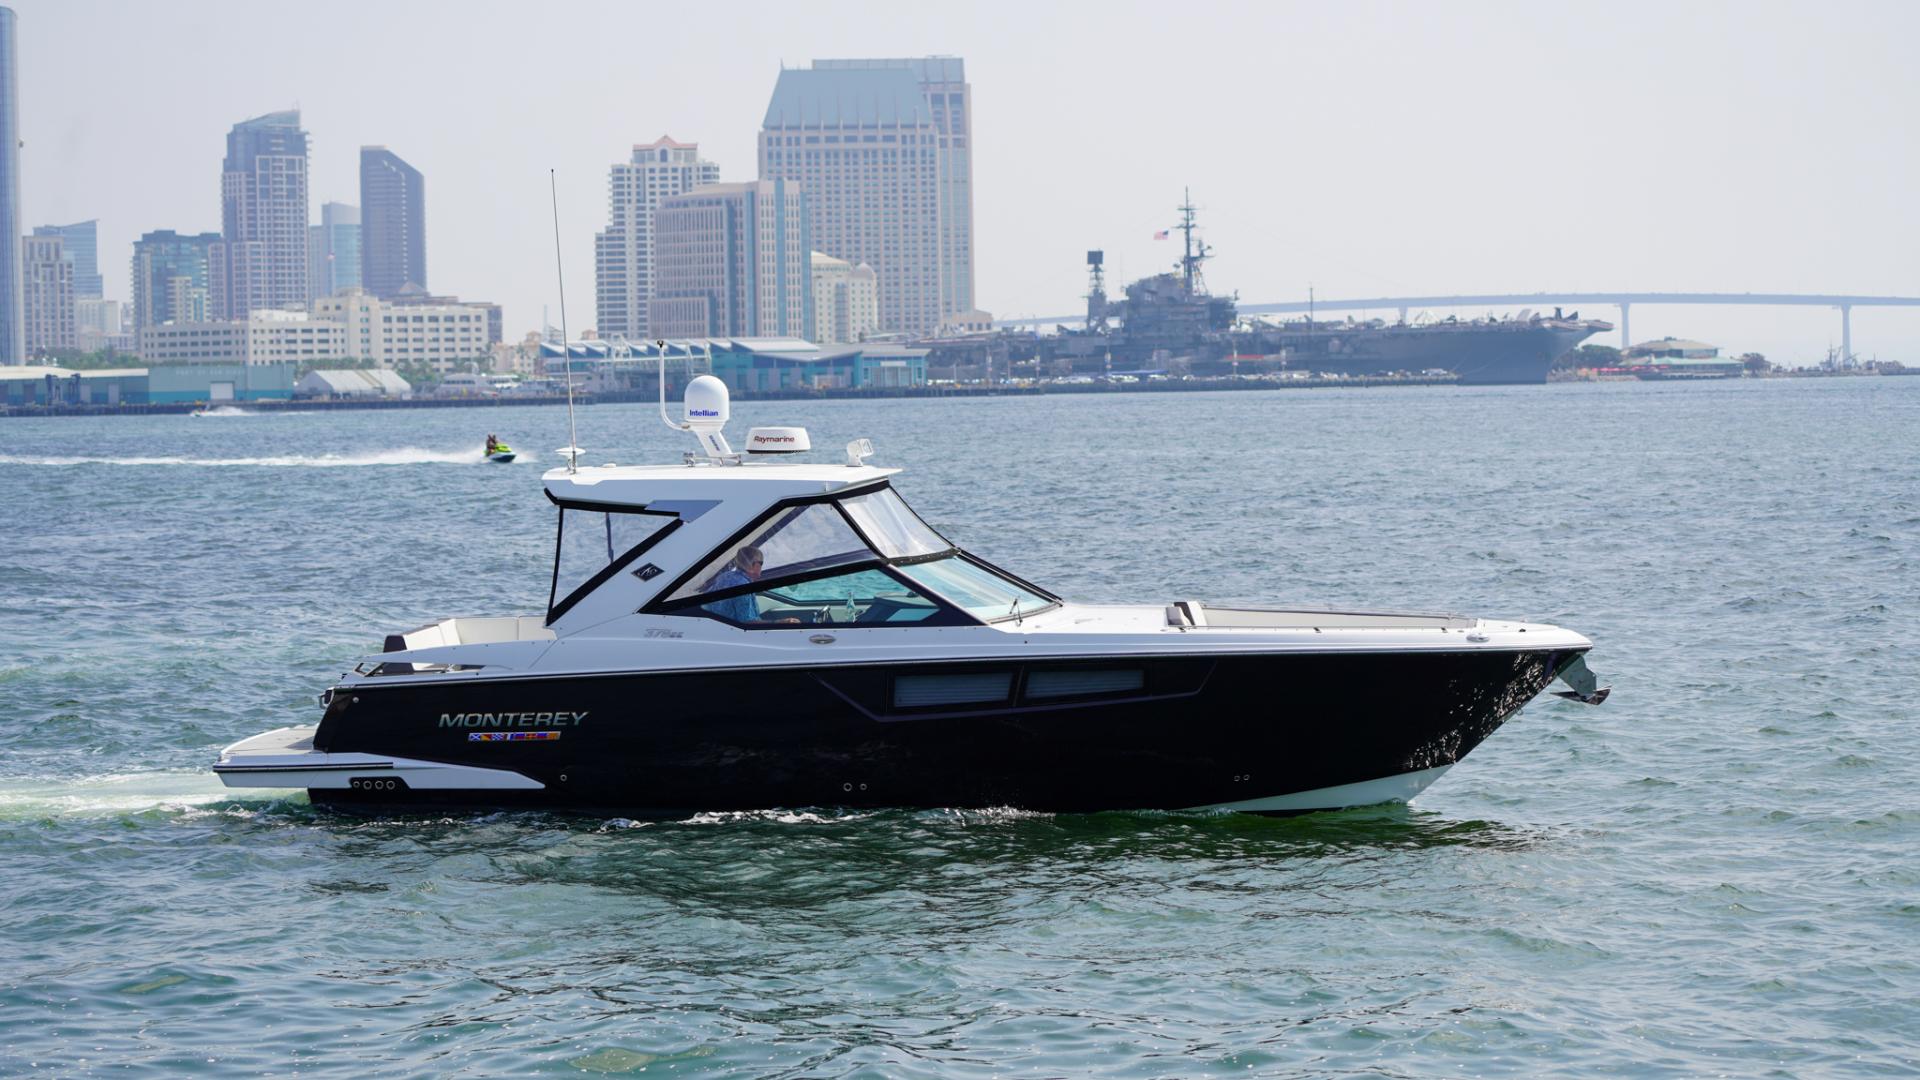 Monterey-378SE 2019-MATONE IV California-United States-MATONE IV EXTERIOR-1511130   Thumbnail